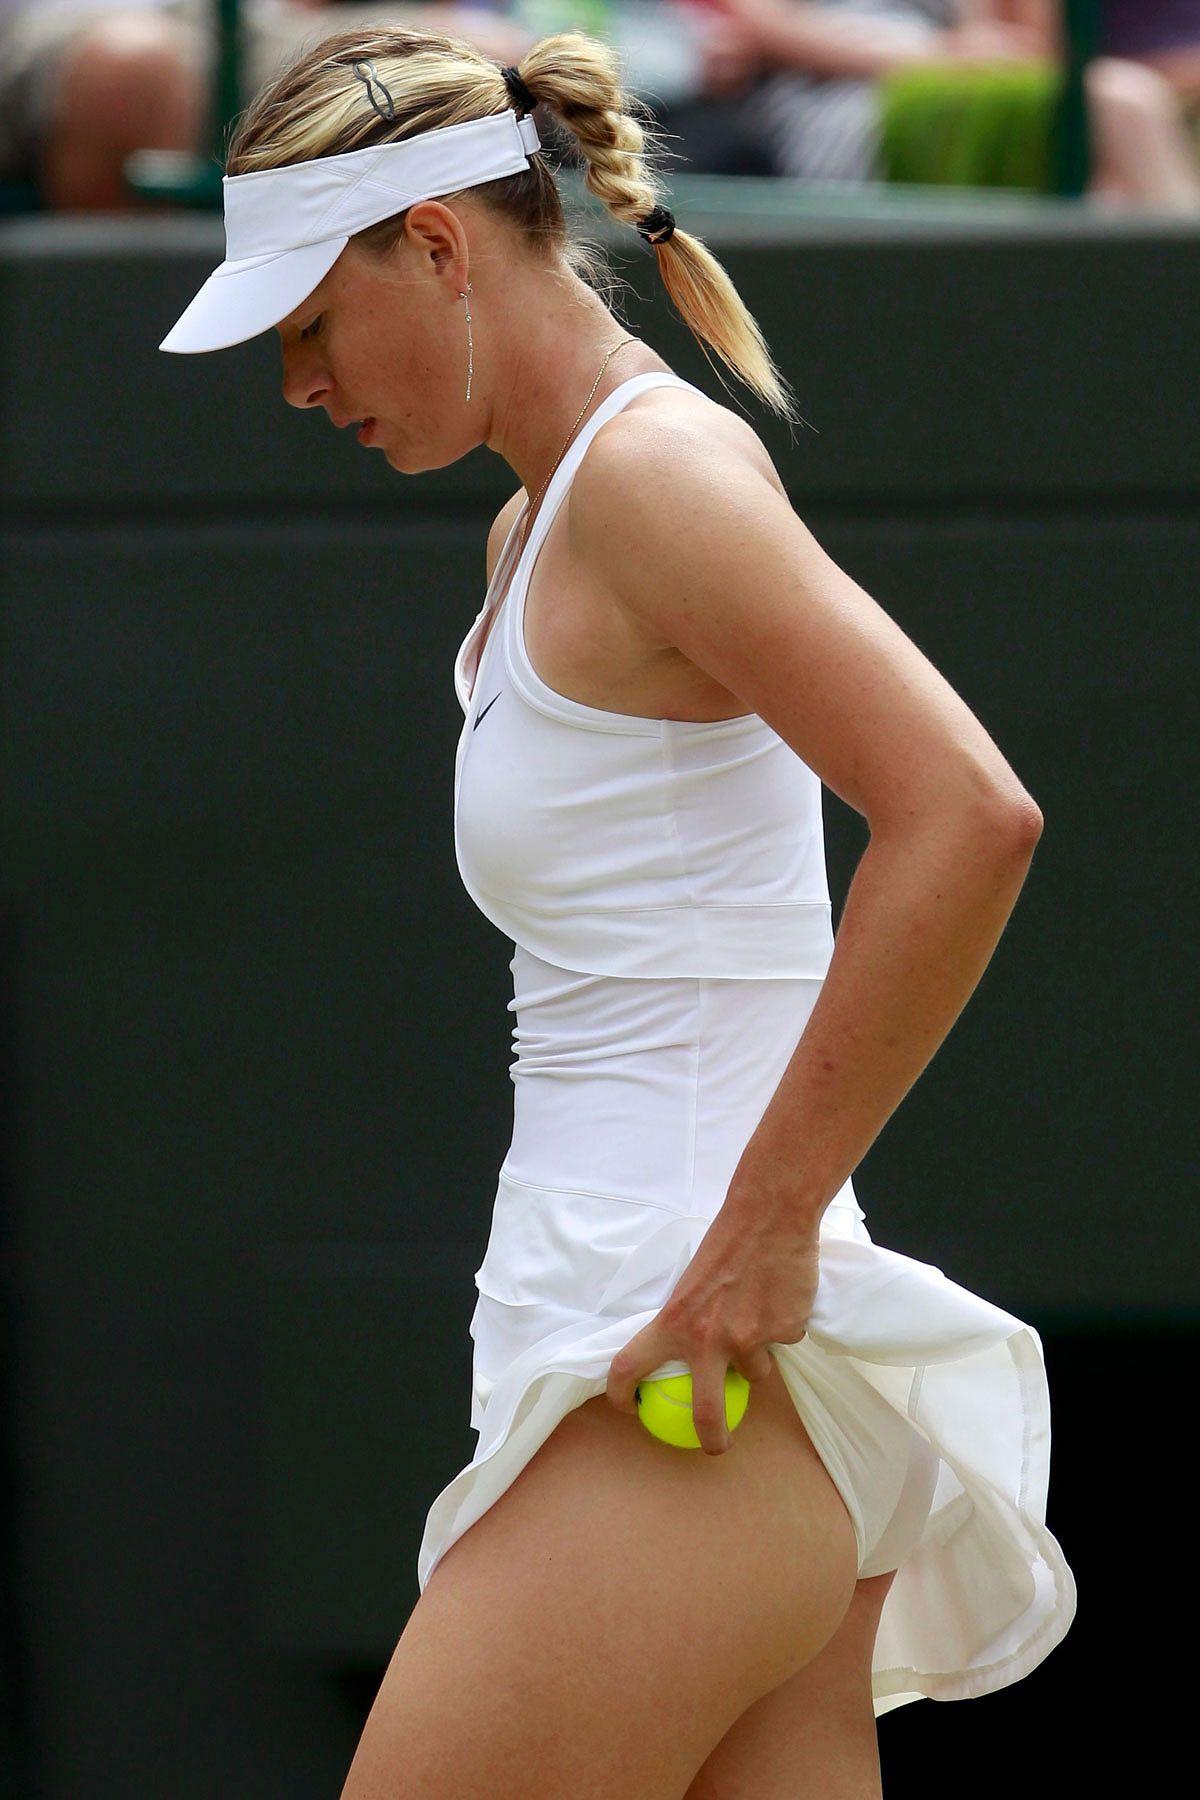 tennis players upskirt pics